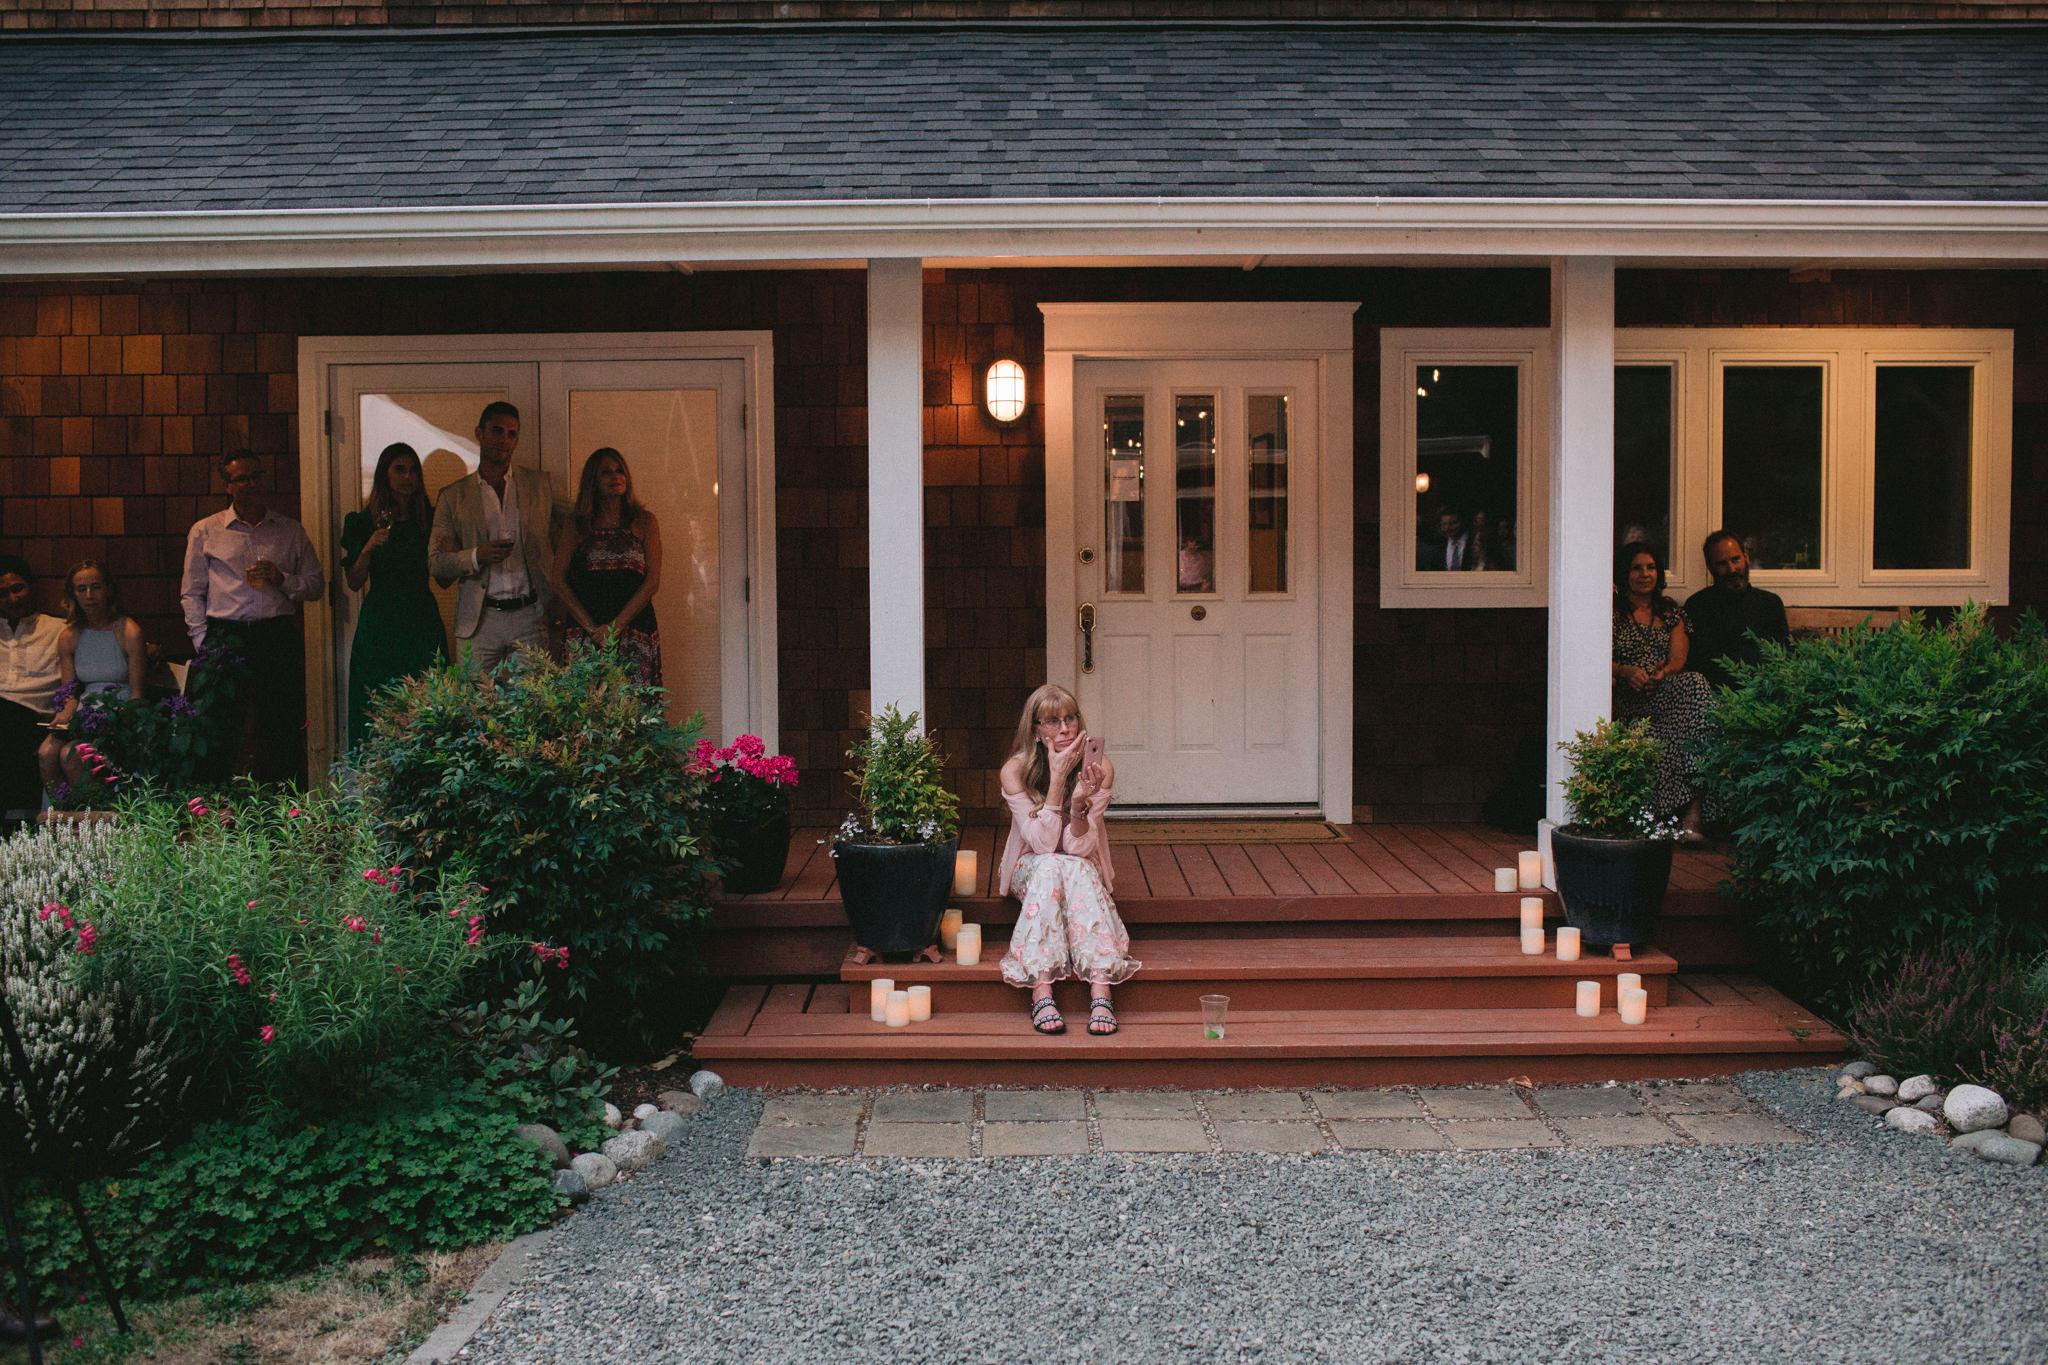 Backyard-Bainbridge-Island-Wedding-Alycia-Lovell-Photography-201.JPG